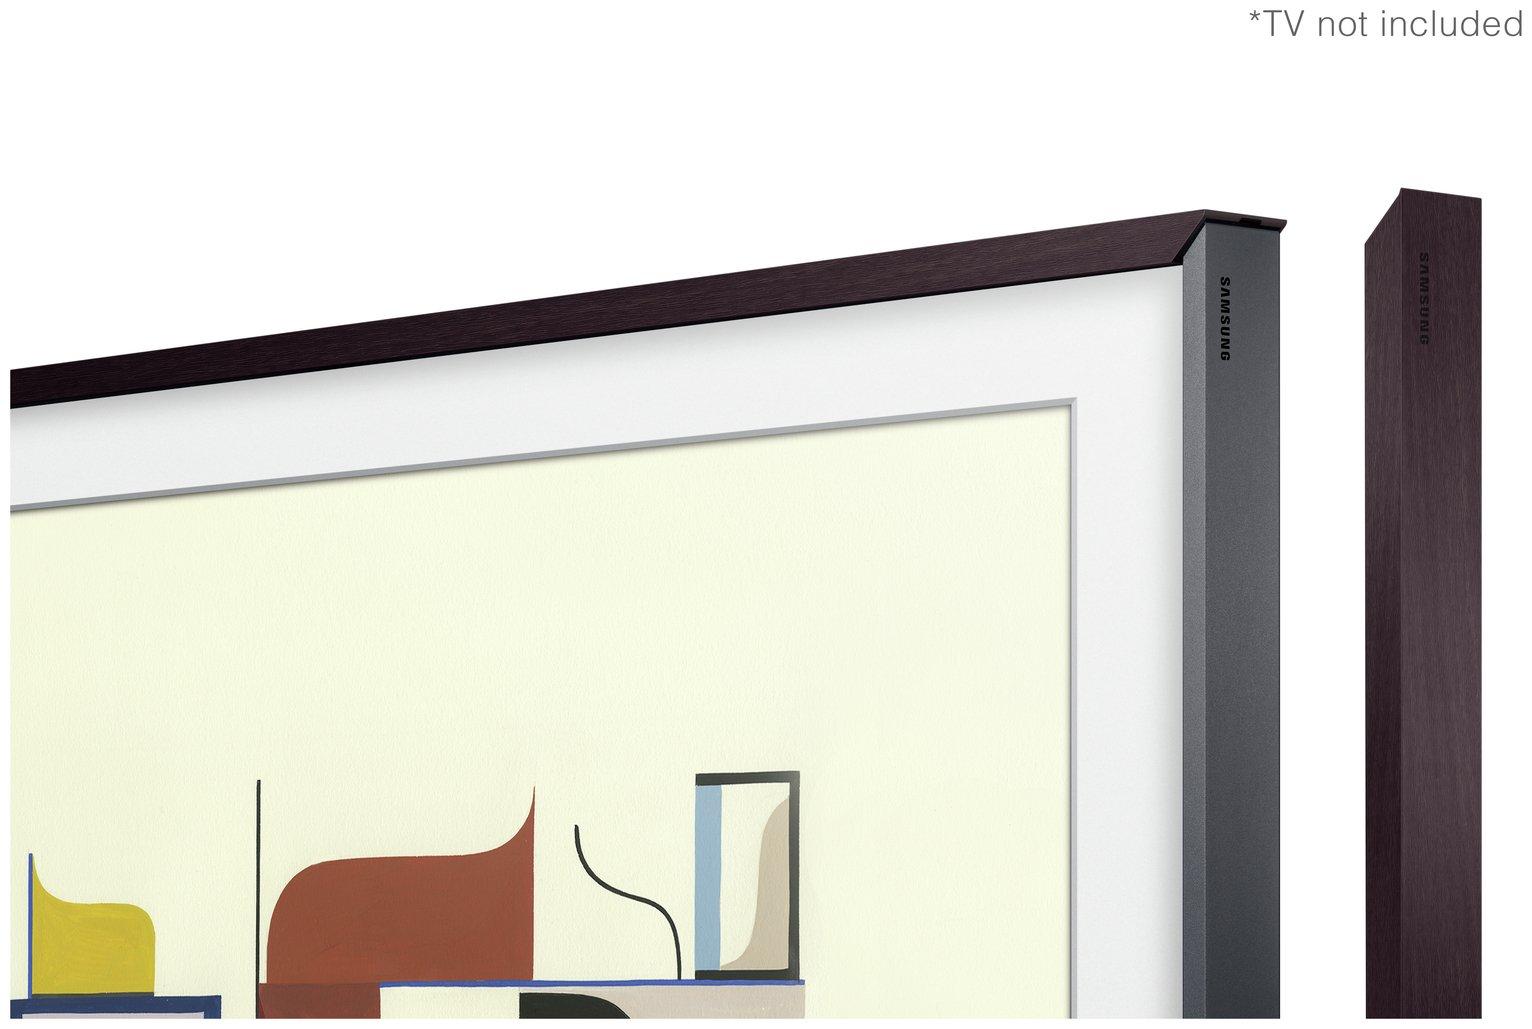 Samsung Customisable Bezel for The Frame 43 Inch TV - Brown